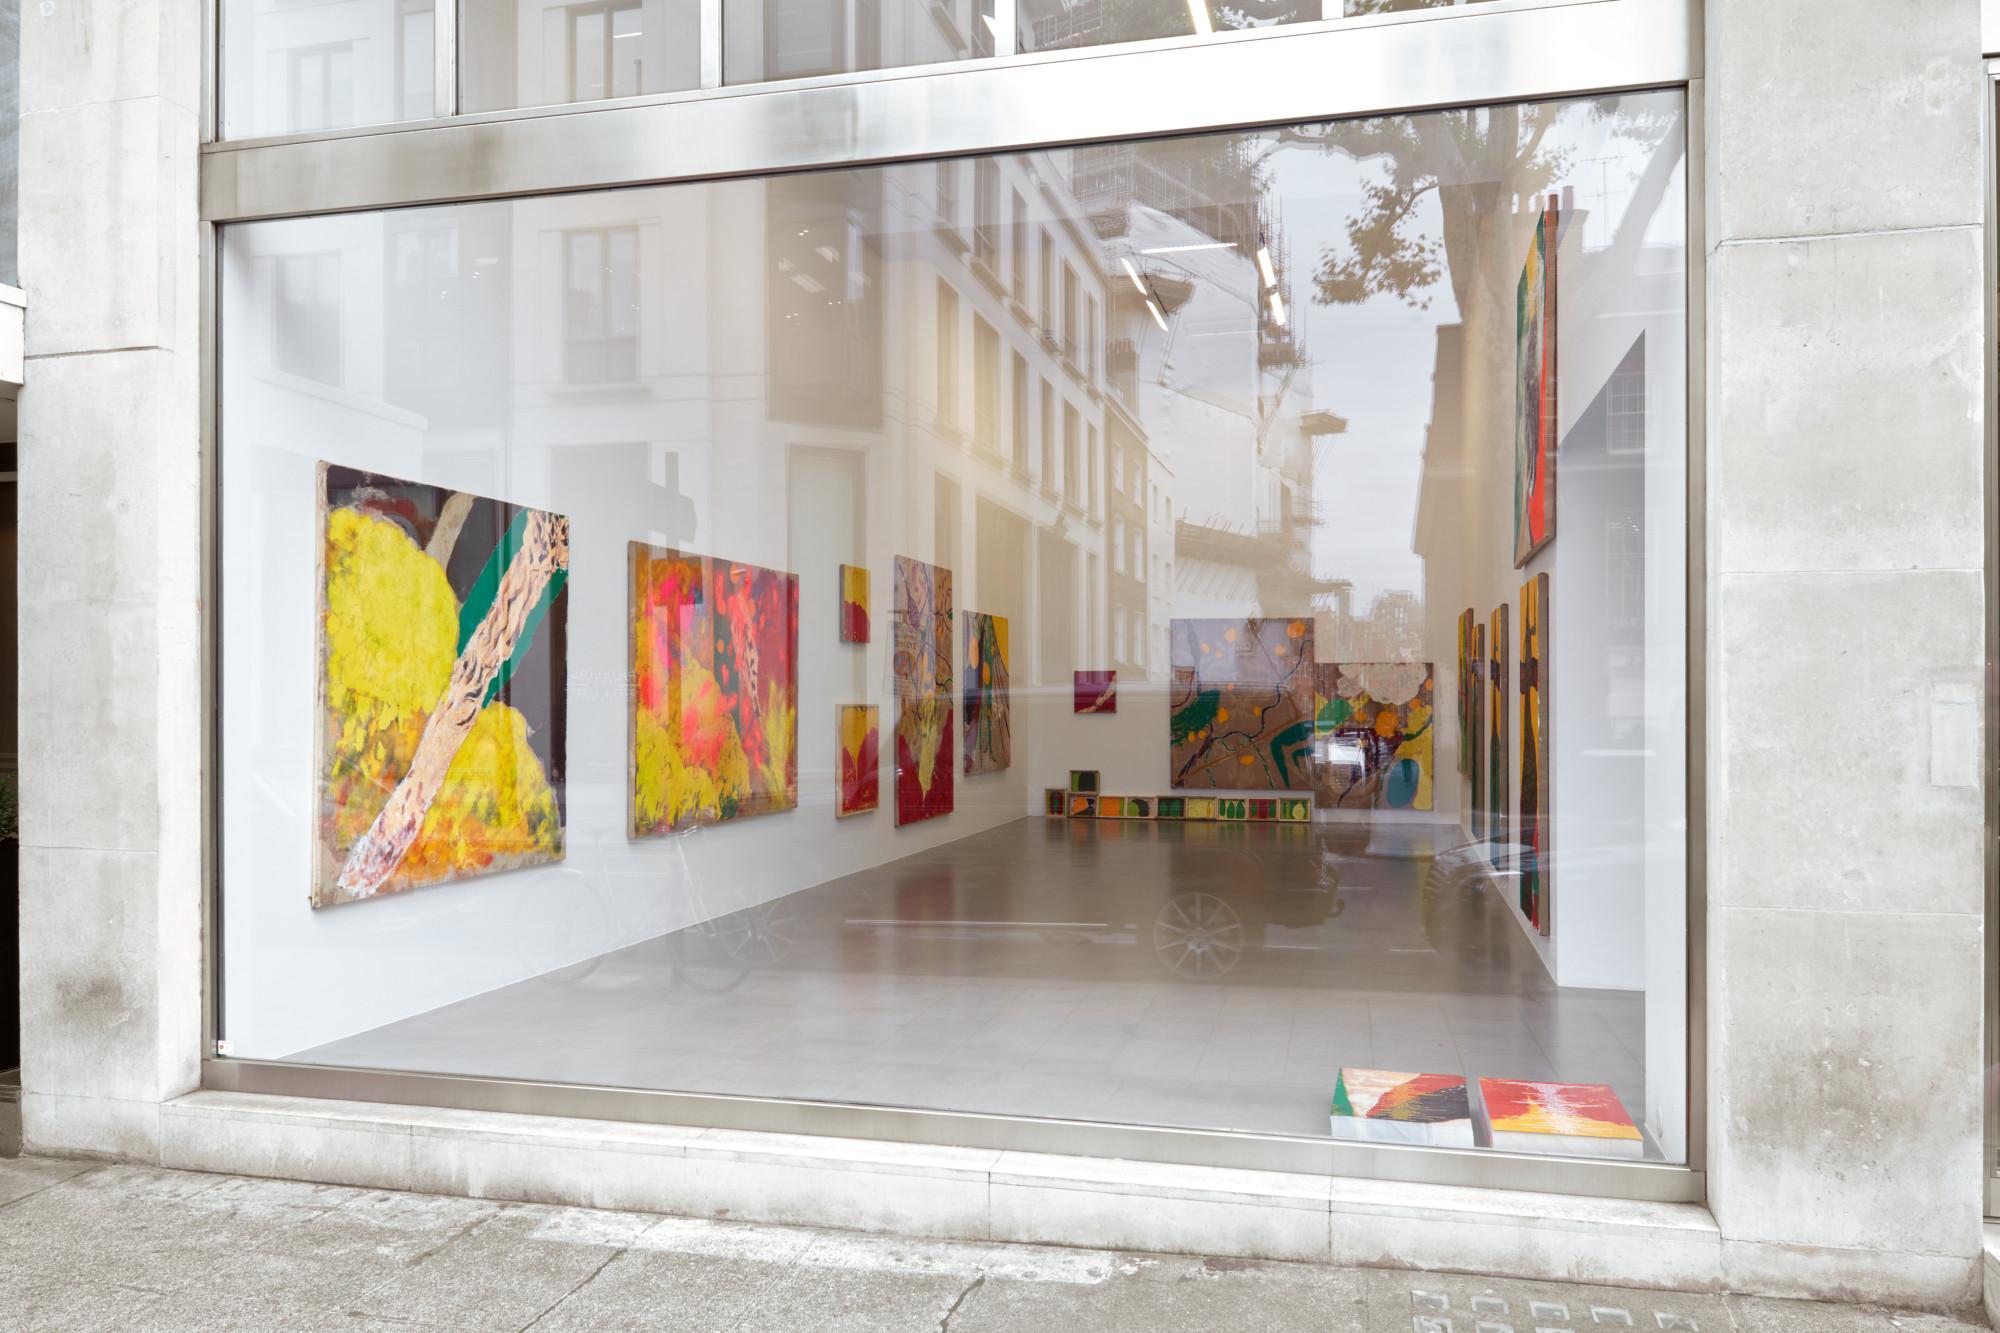 <p>Installation view, Alvaro Barrington, GARVEY: SEX LOVE NUTURING FAMALAY, Sadie Coles HQ, 1 Davies Street, 7 Sept - 26 October 2019<br />Photo: Robert Glowacki</p>